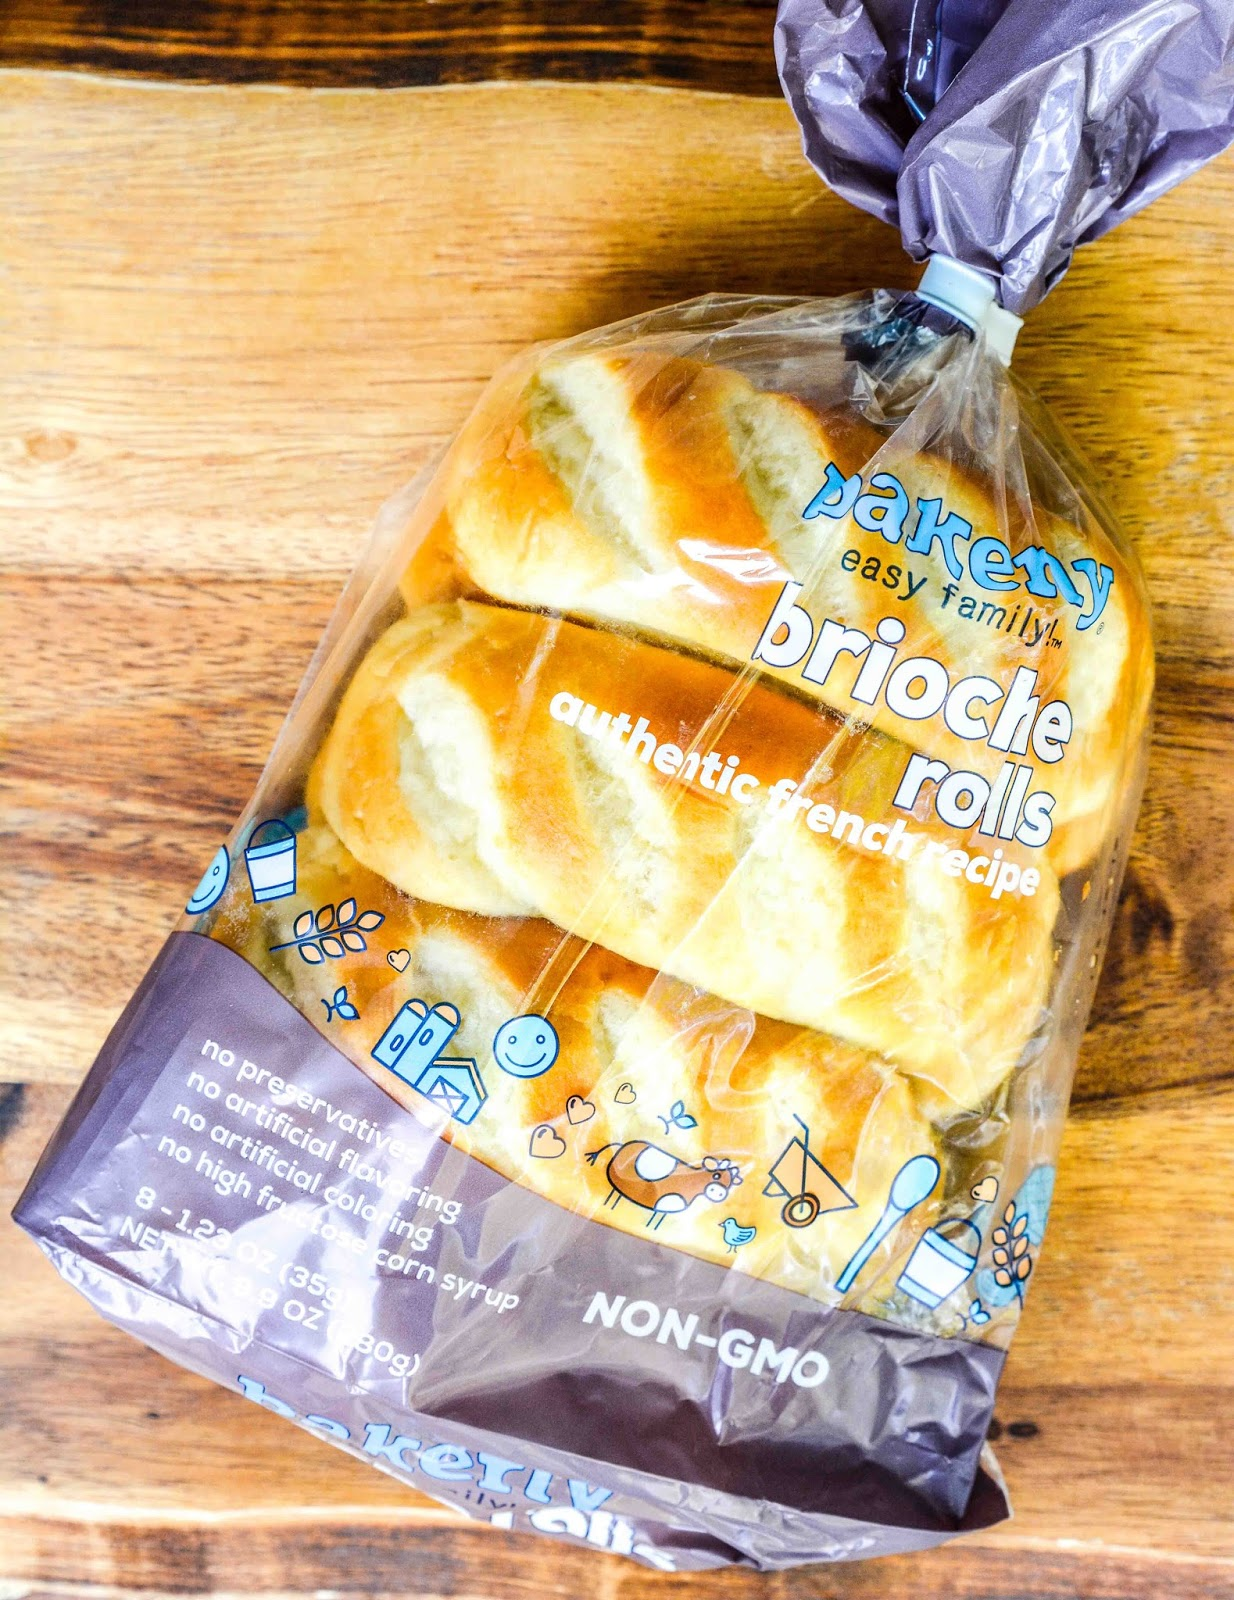 Bakerly Brioche Rolls